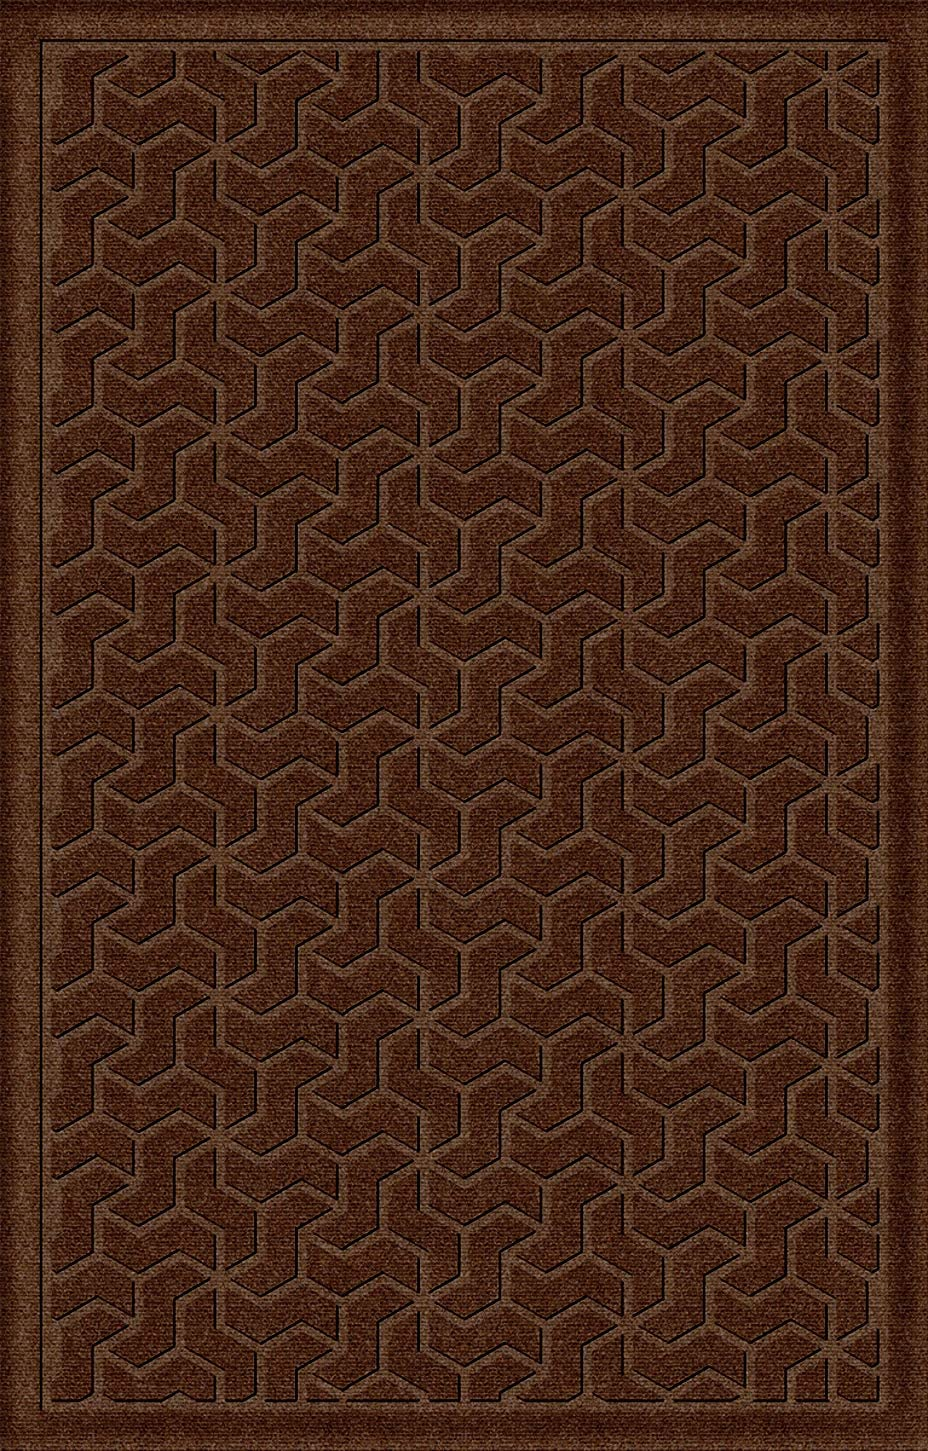 American Floor Mats Windmill Designer Floor Mat – Dark Brown 4 x 6 with Gripper Backing, Matching Fabric Borders